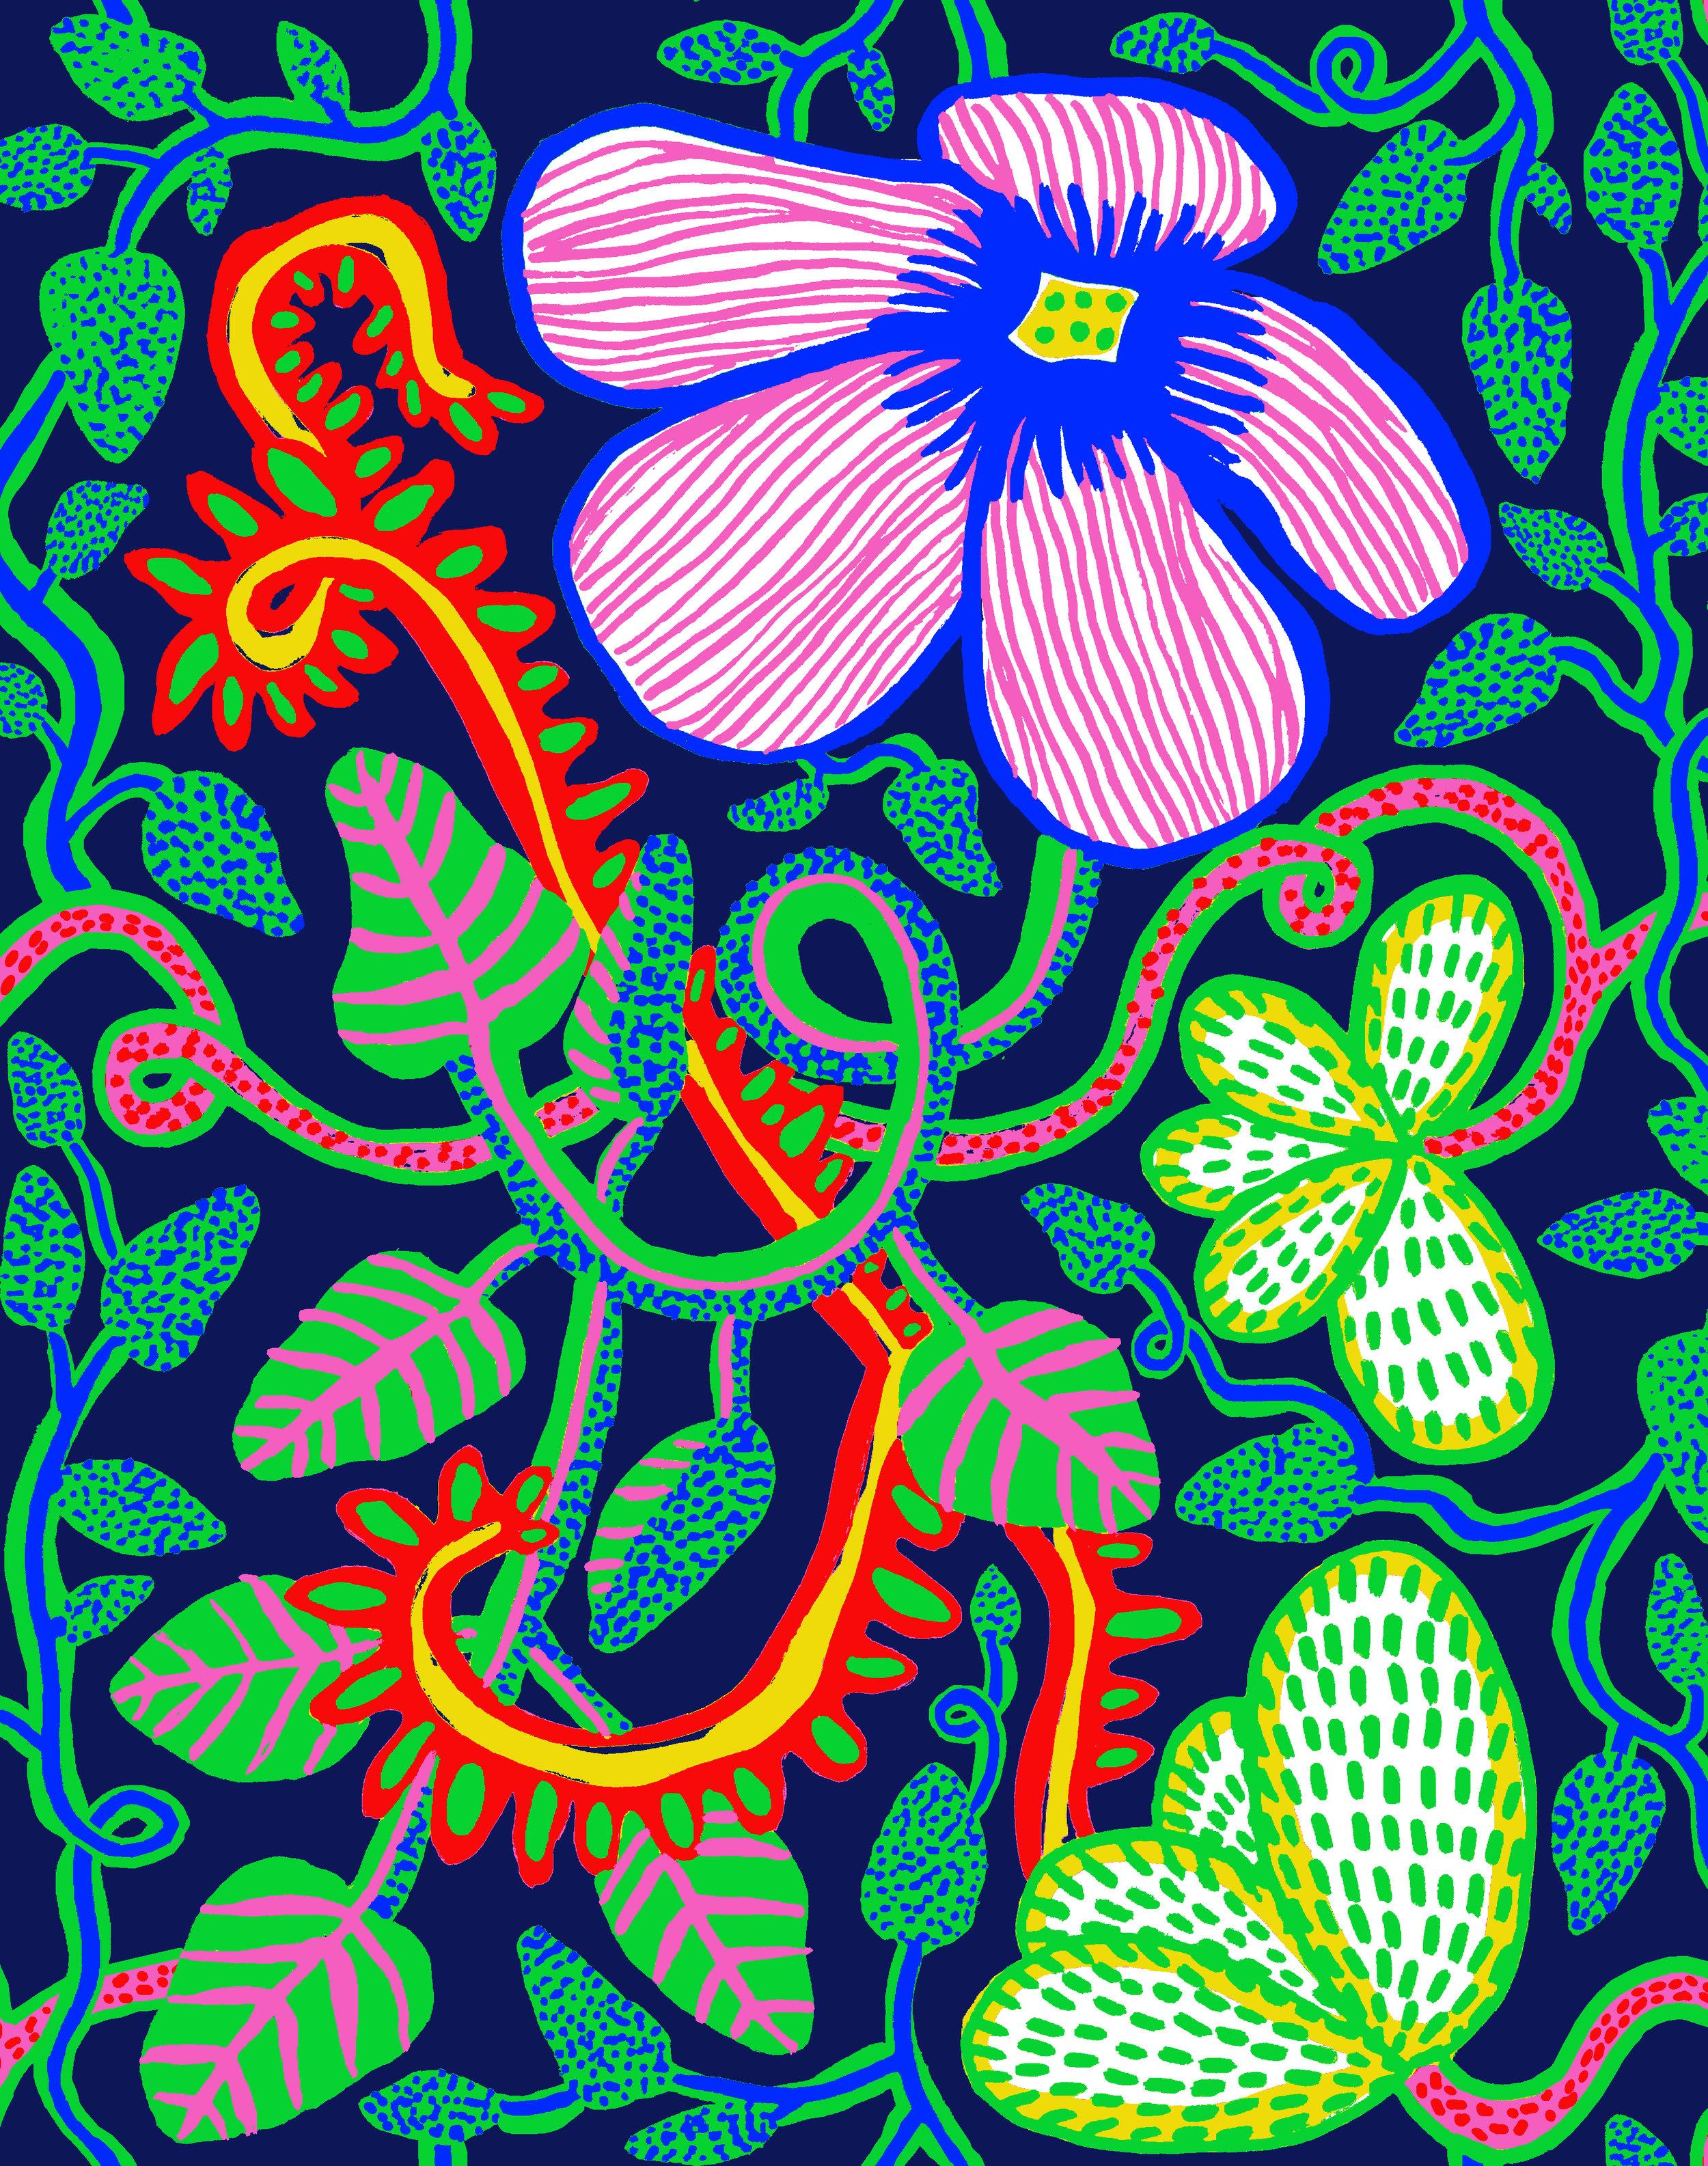 Imaginaryflowers_Matilda_Palmu.jpg